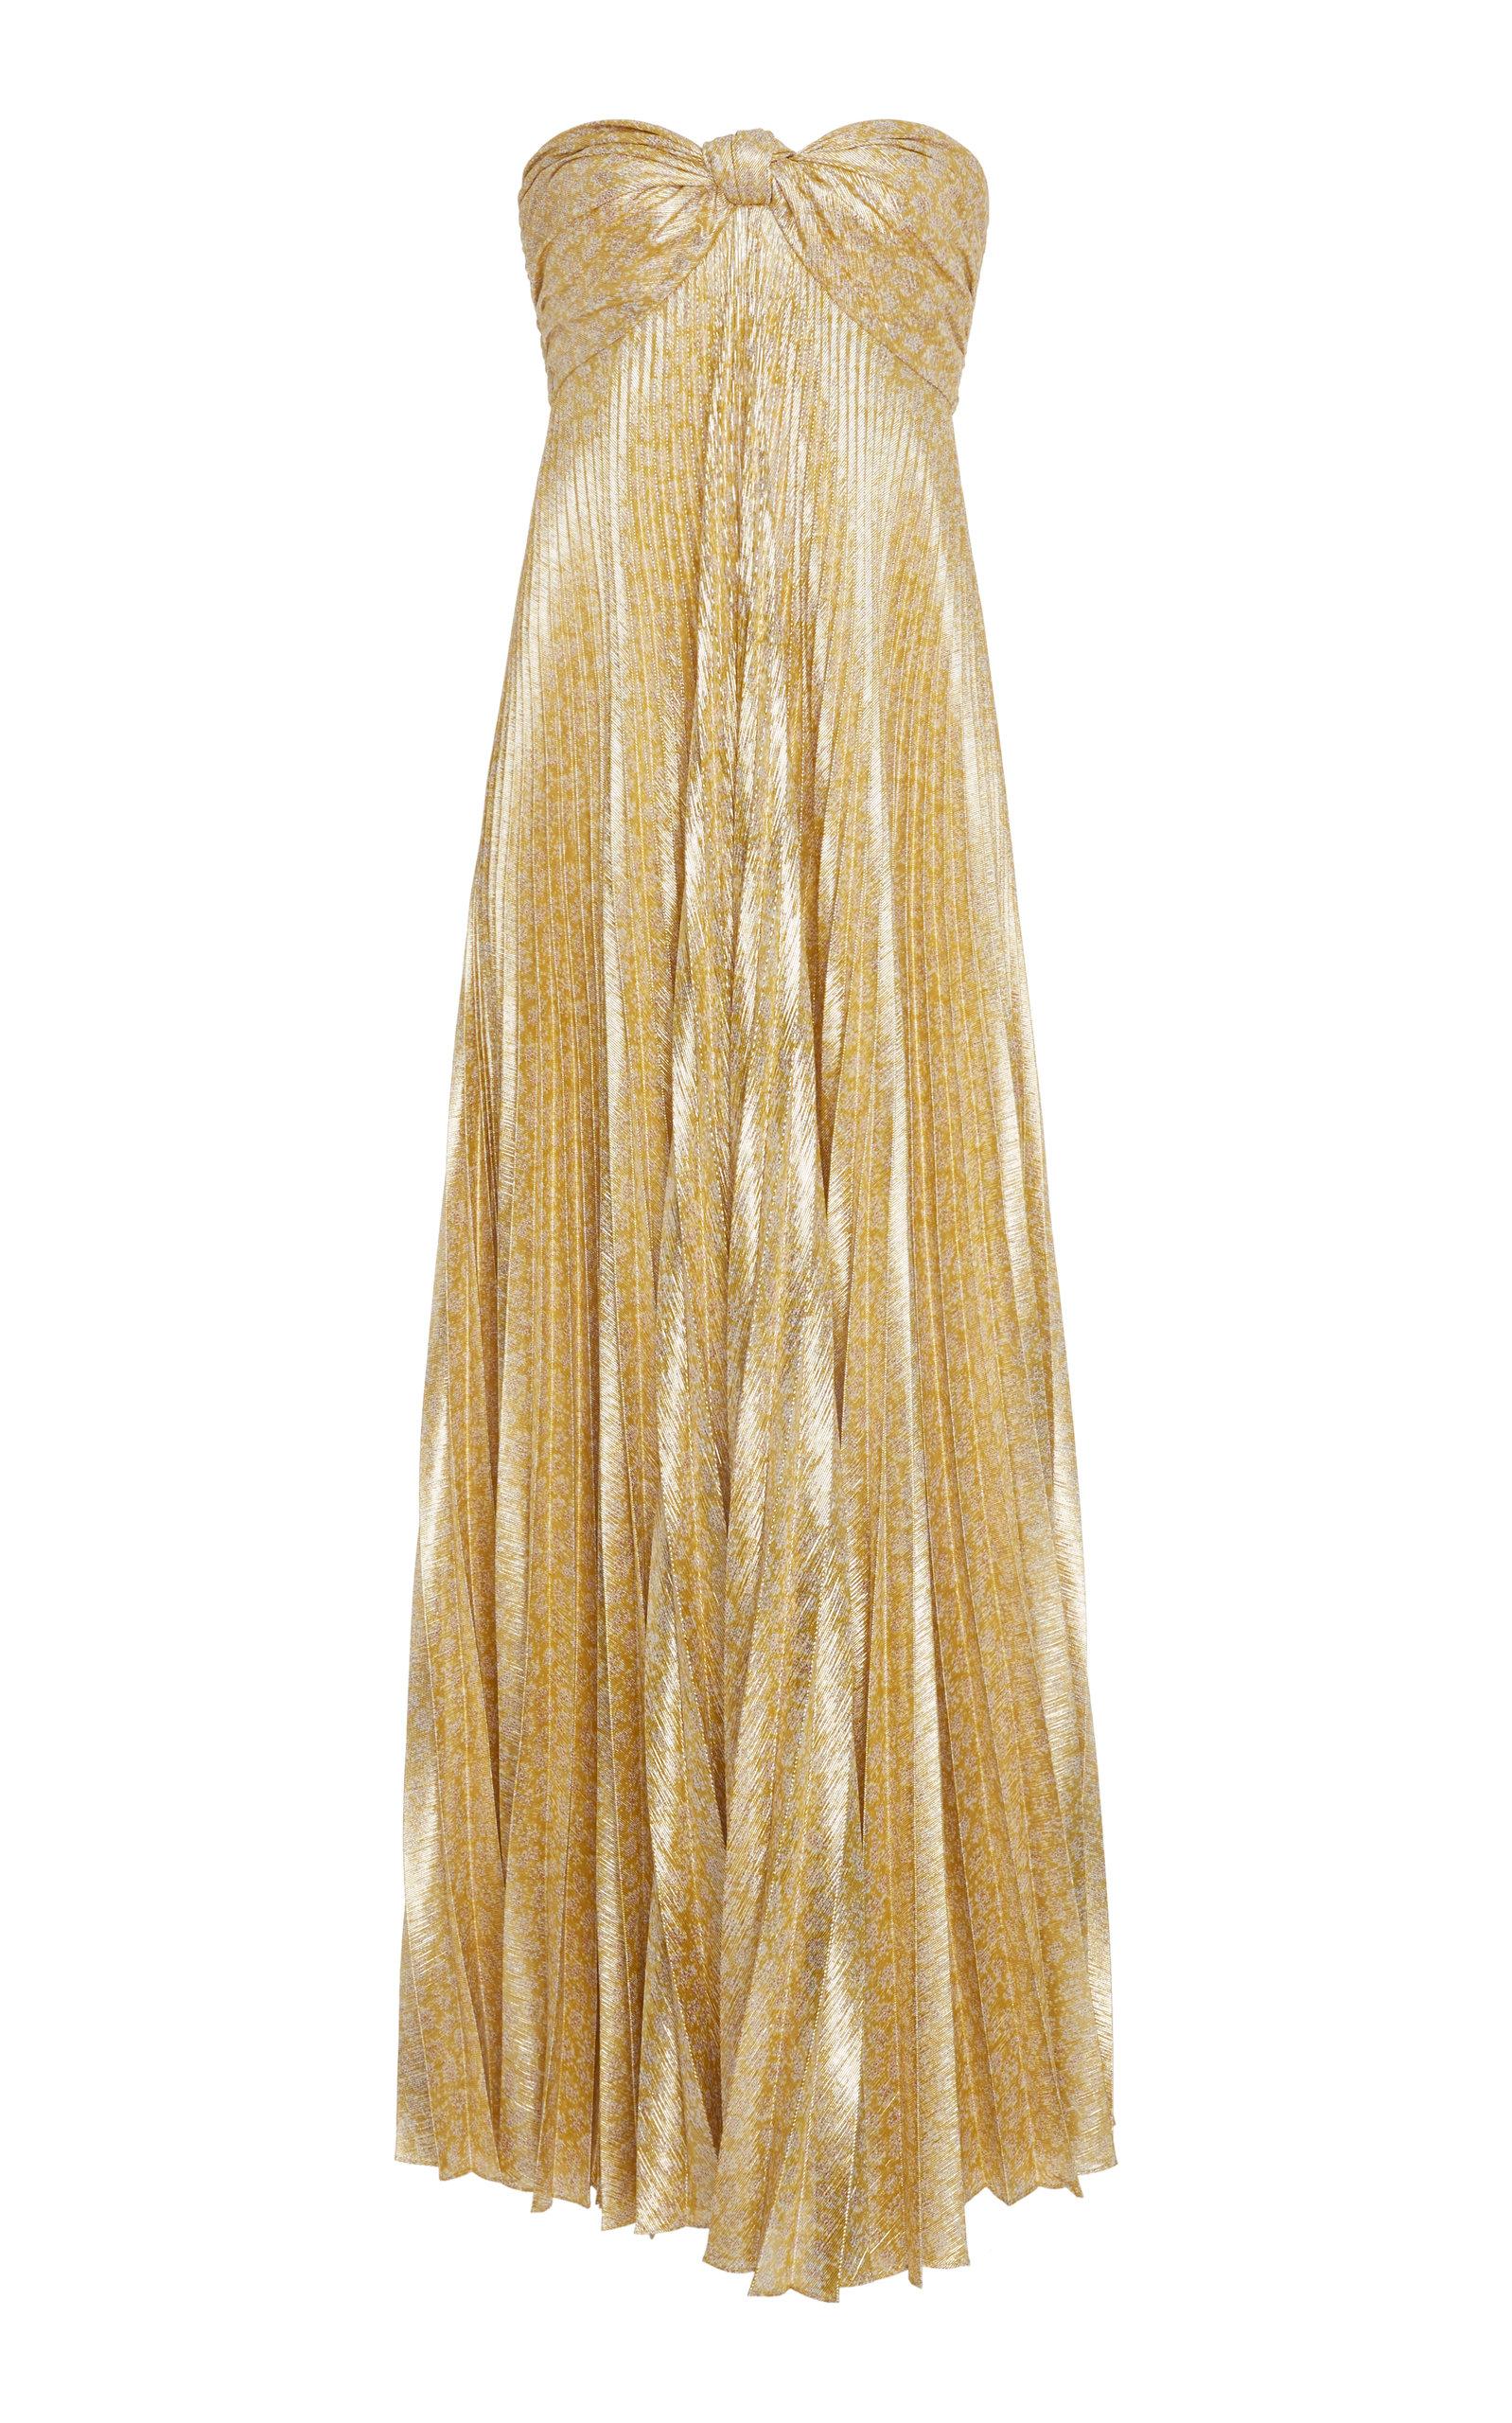 Joya Strapless Sweetheart Lamé Pleated A-Line Dress in Gold Lame